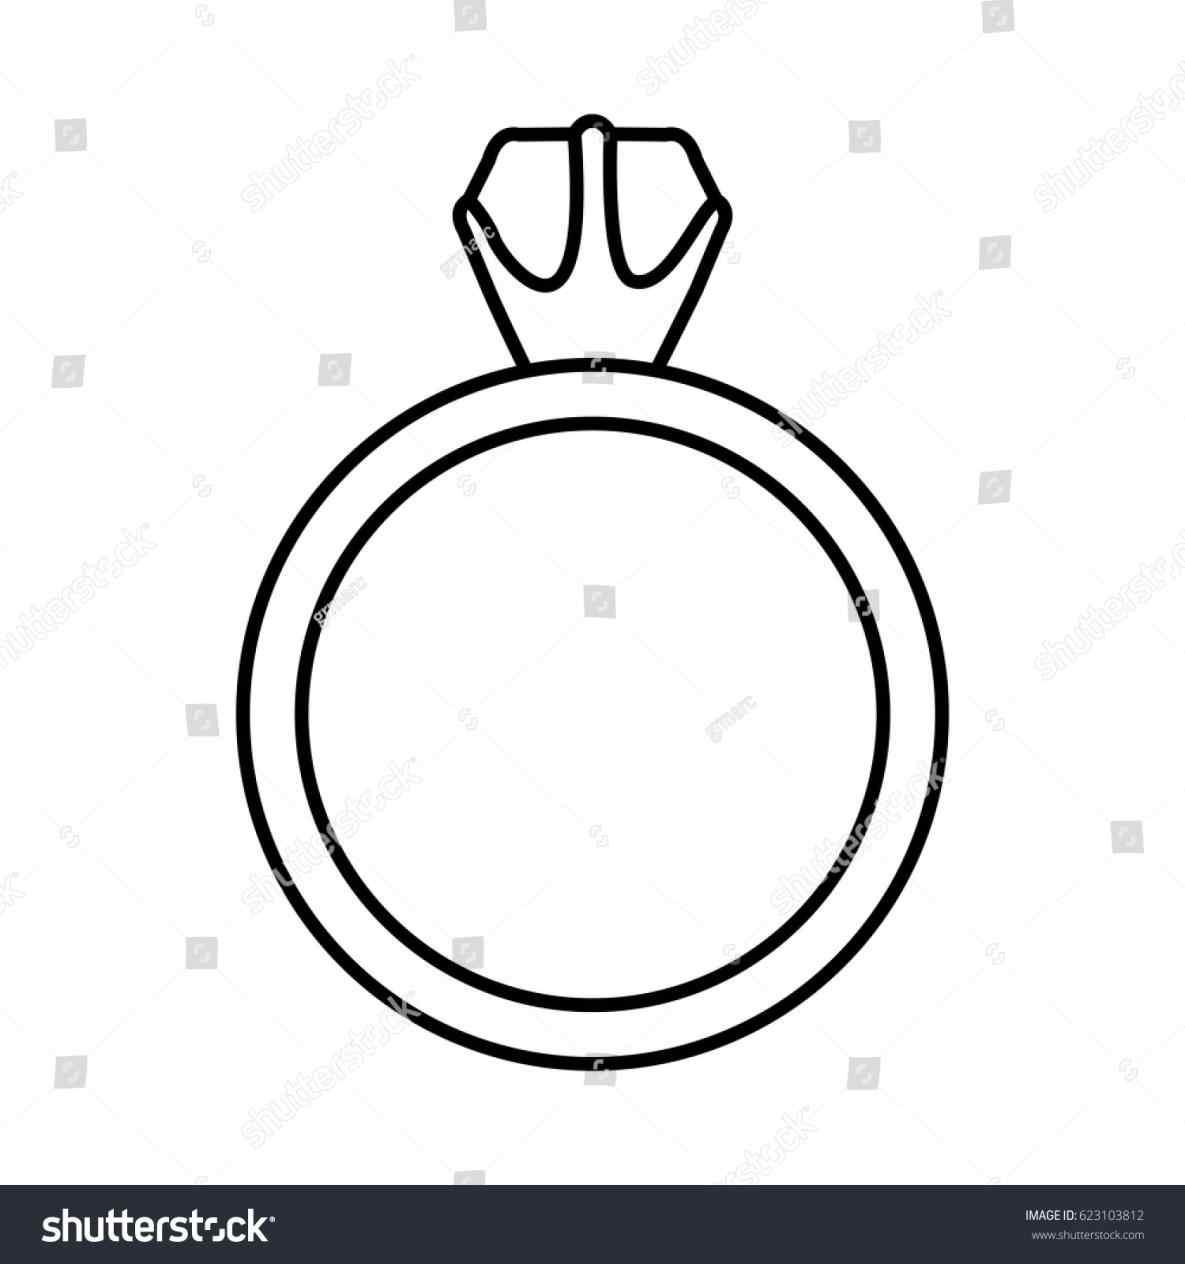 1185x1264 Diamond Ring Silhouette Vector Ringgow.win